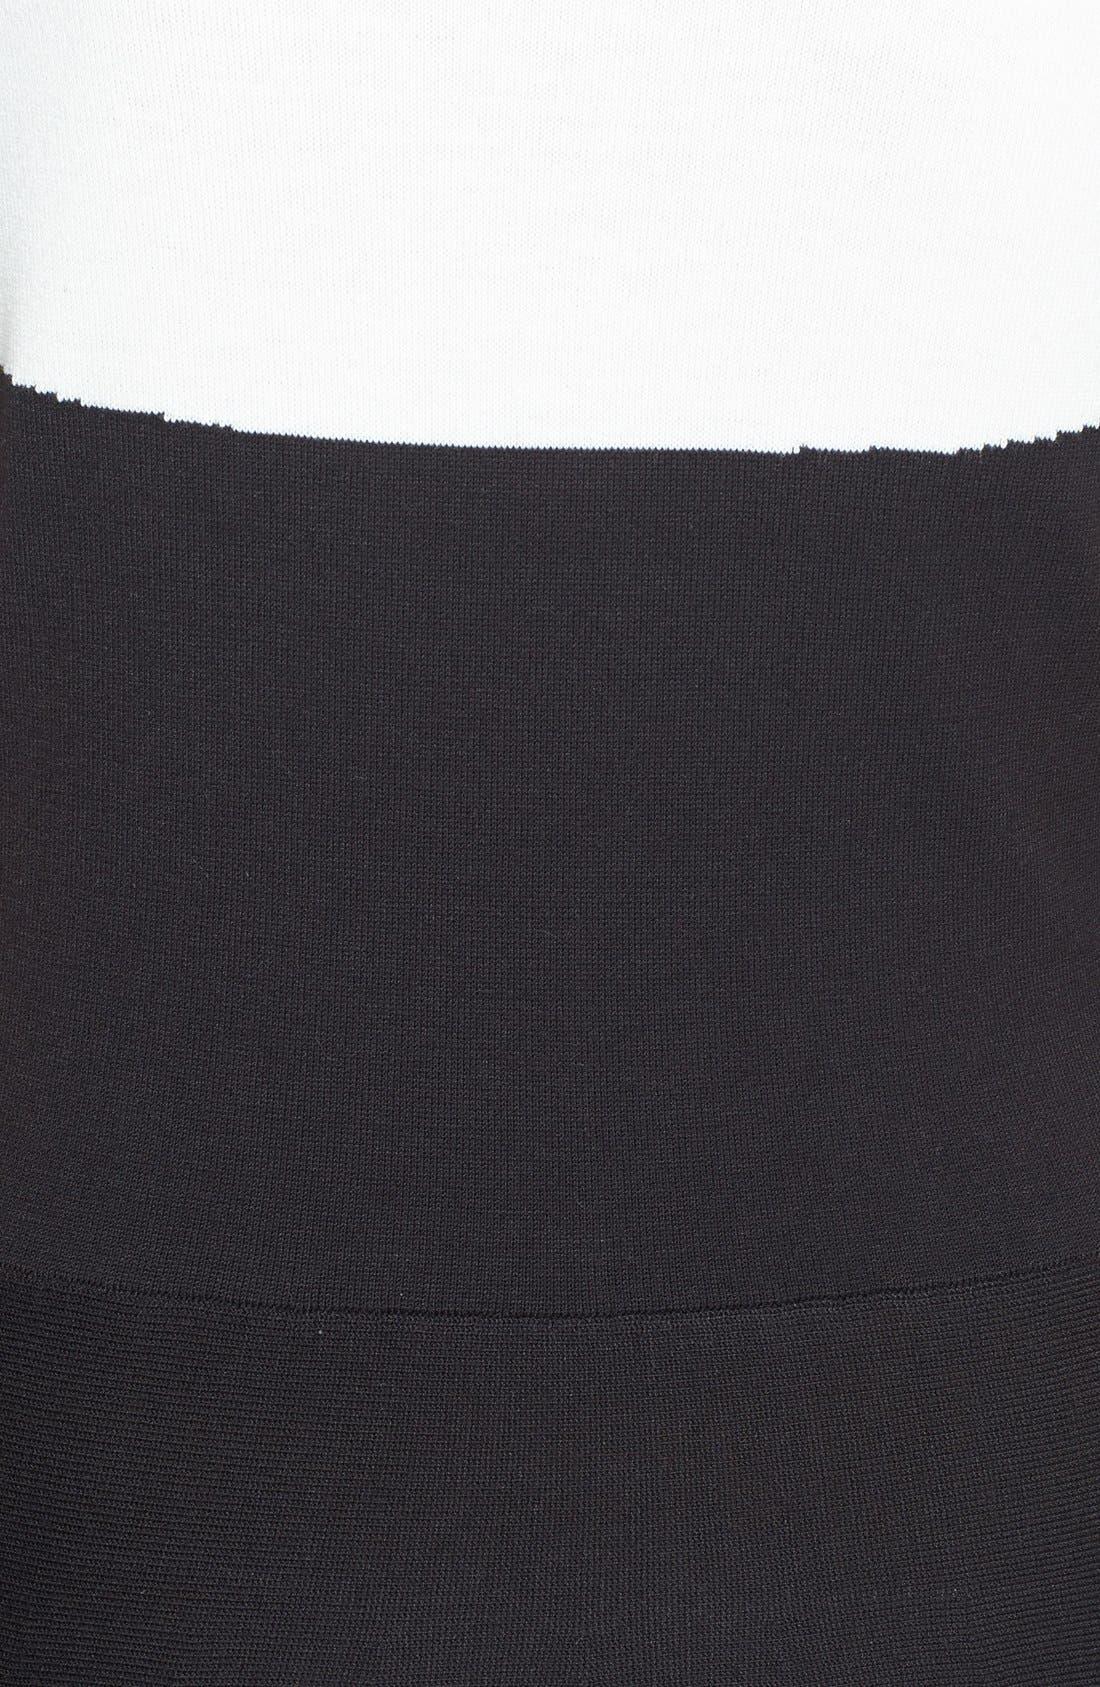 Alternate Image 3  - kate spade new york colorblock sweater dress